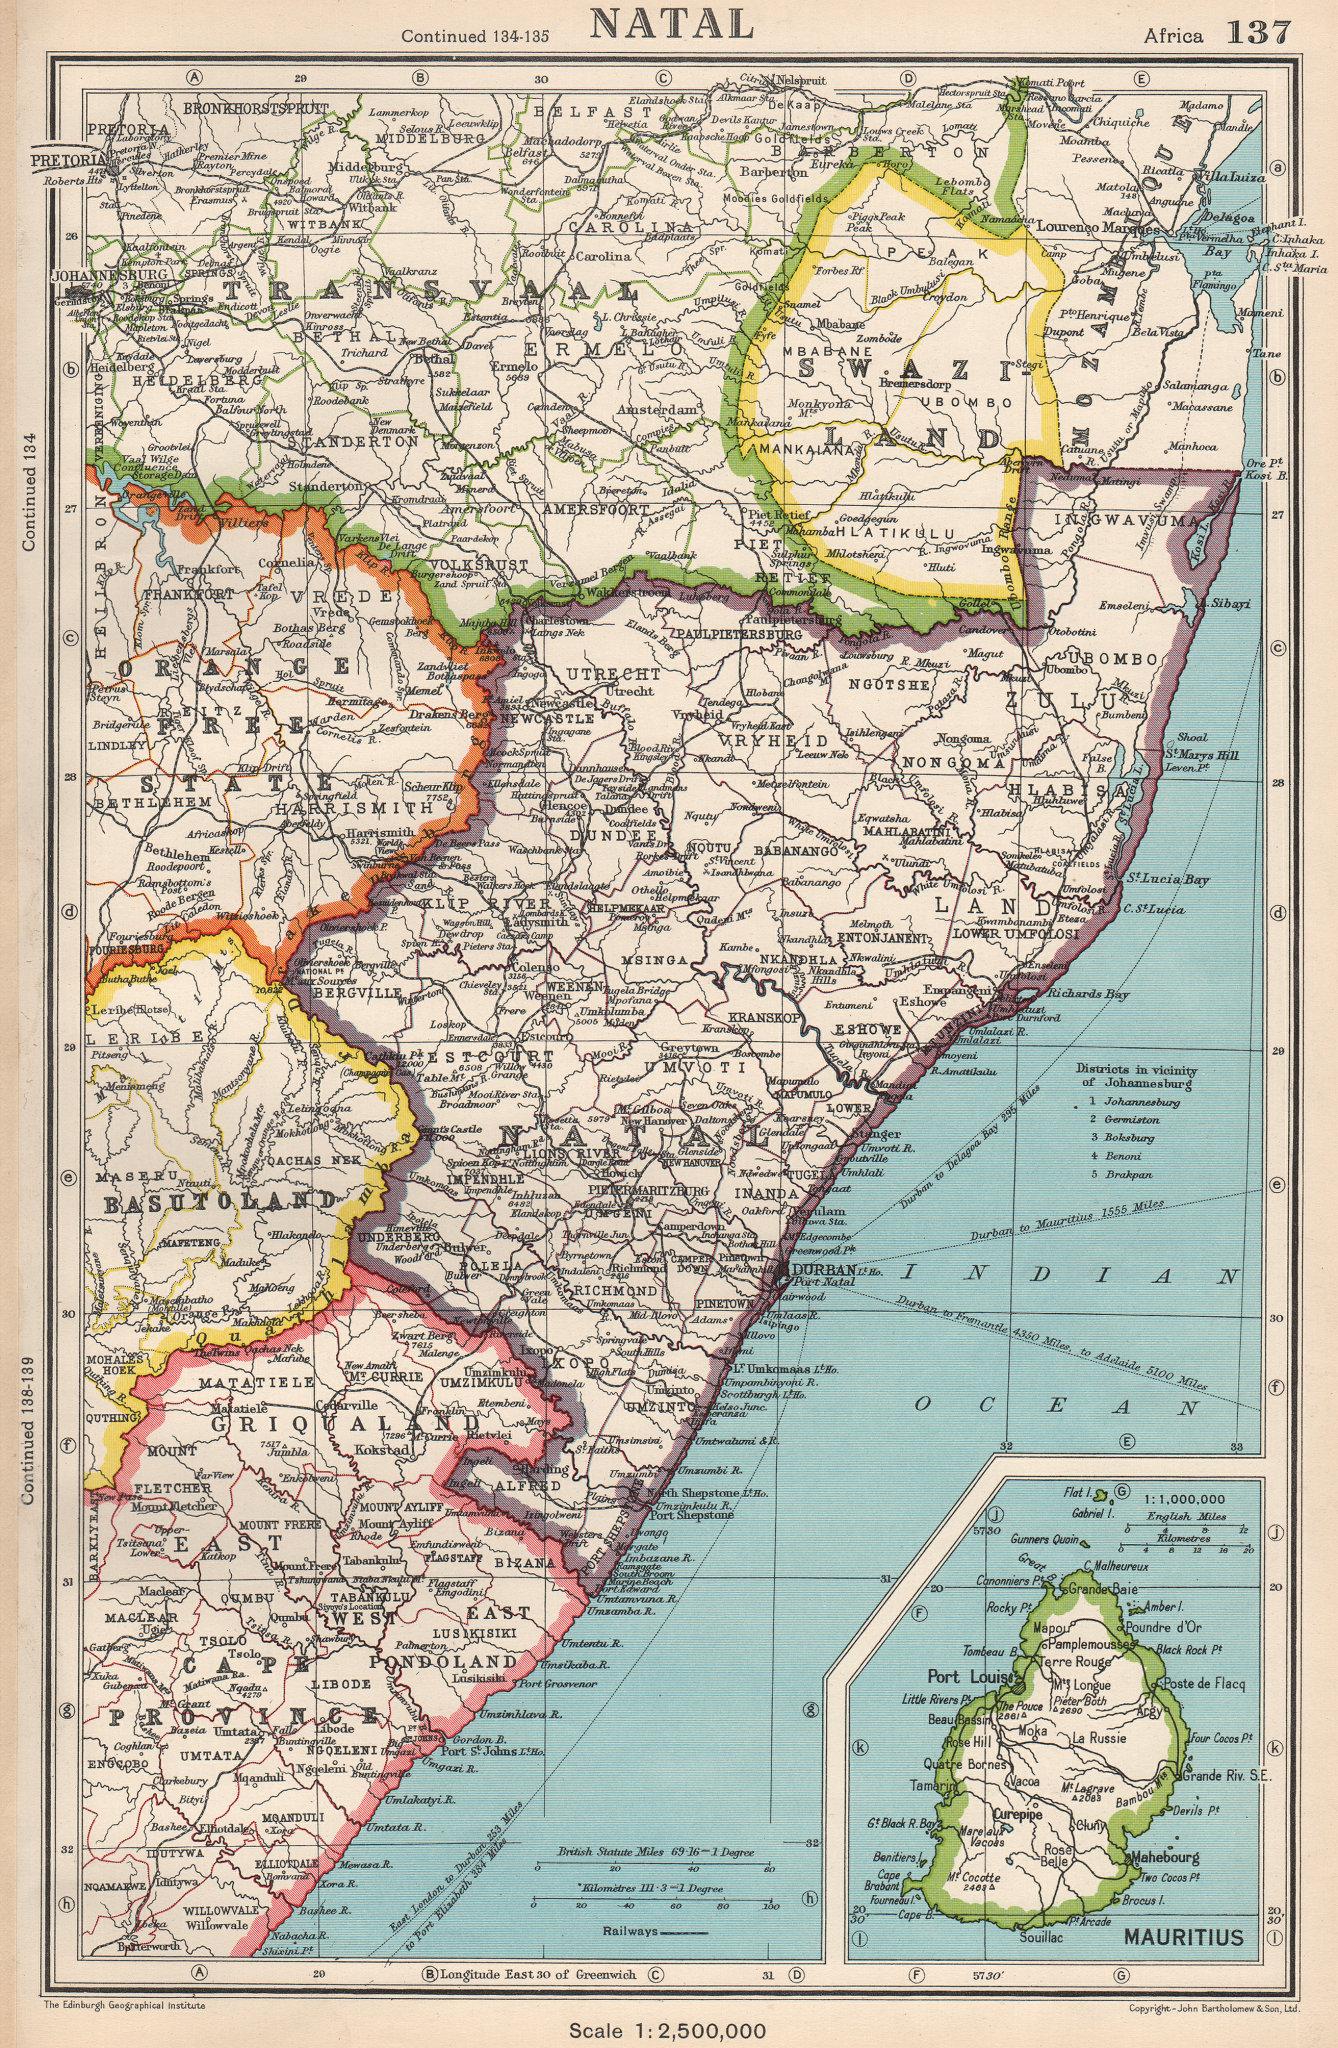 Associate Product NATAL & SWAZILAND. inset Mauritius. South Africa. BARTHOLOMEW 1952 old map